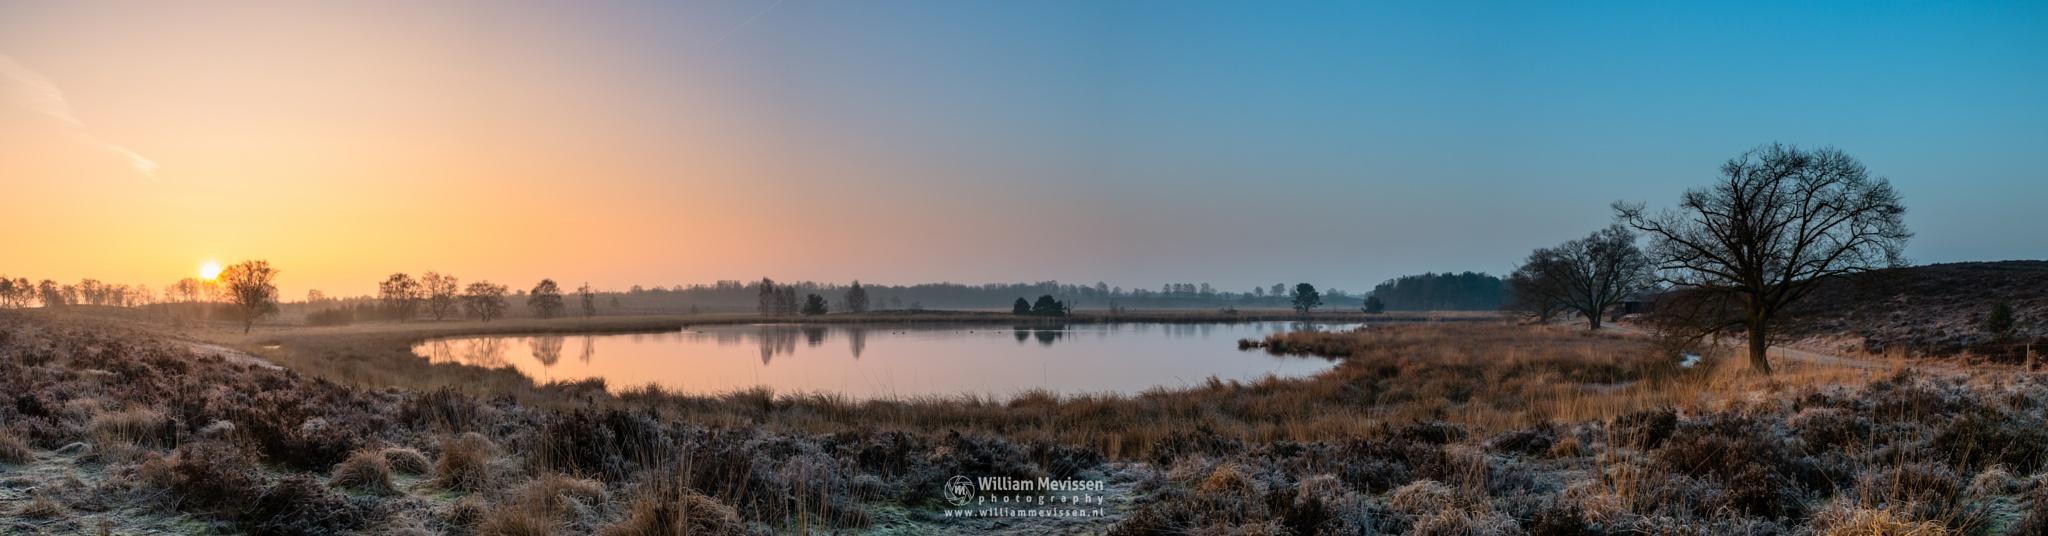 Panorama 'Misty Sunrise Pikmeeuwenwater' by William Mevissen